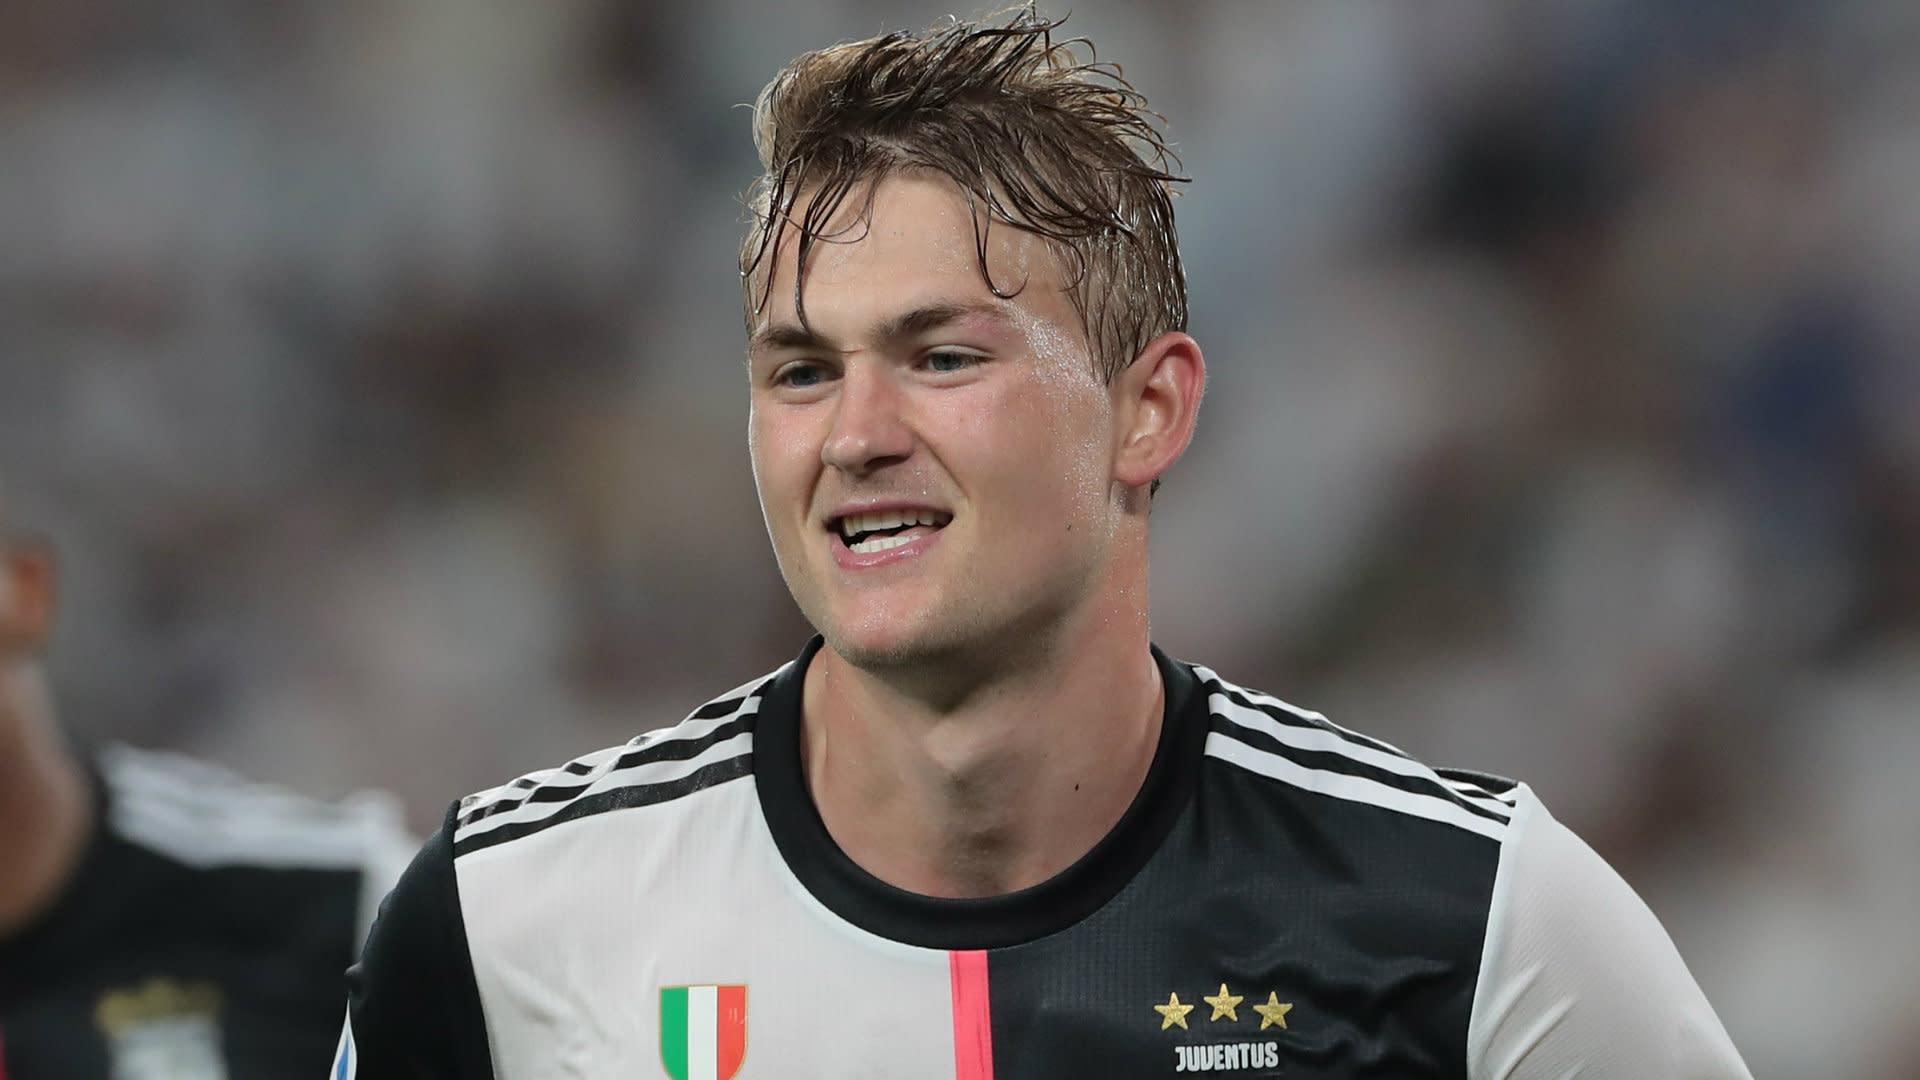 He always stays calm' - Van Dijk backs de Ligt following shaky Juve start